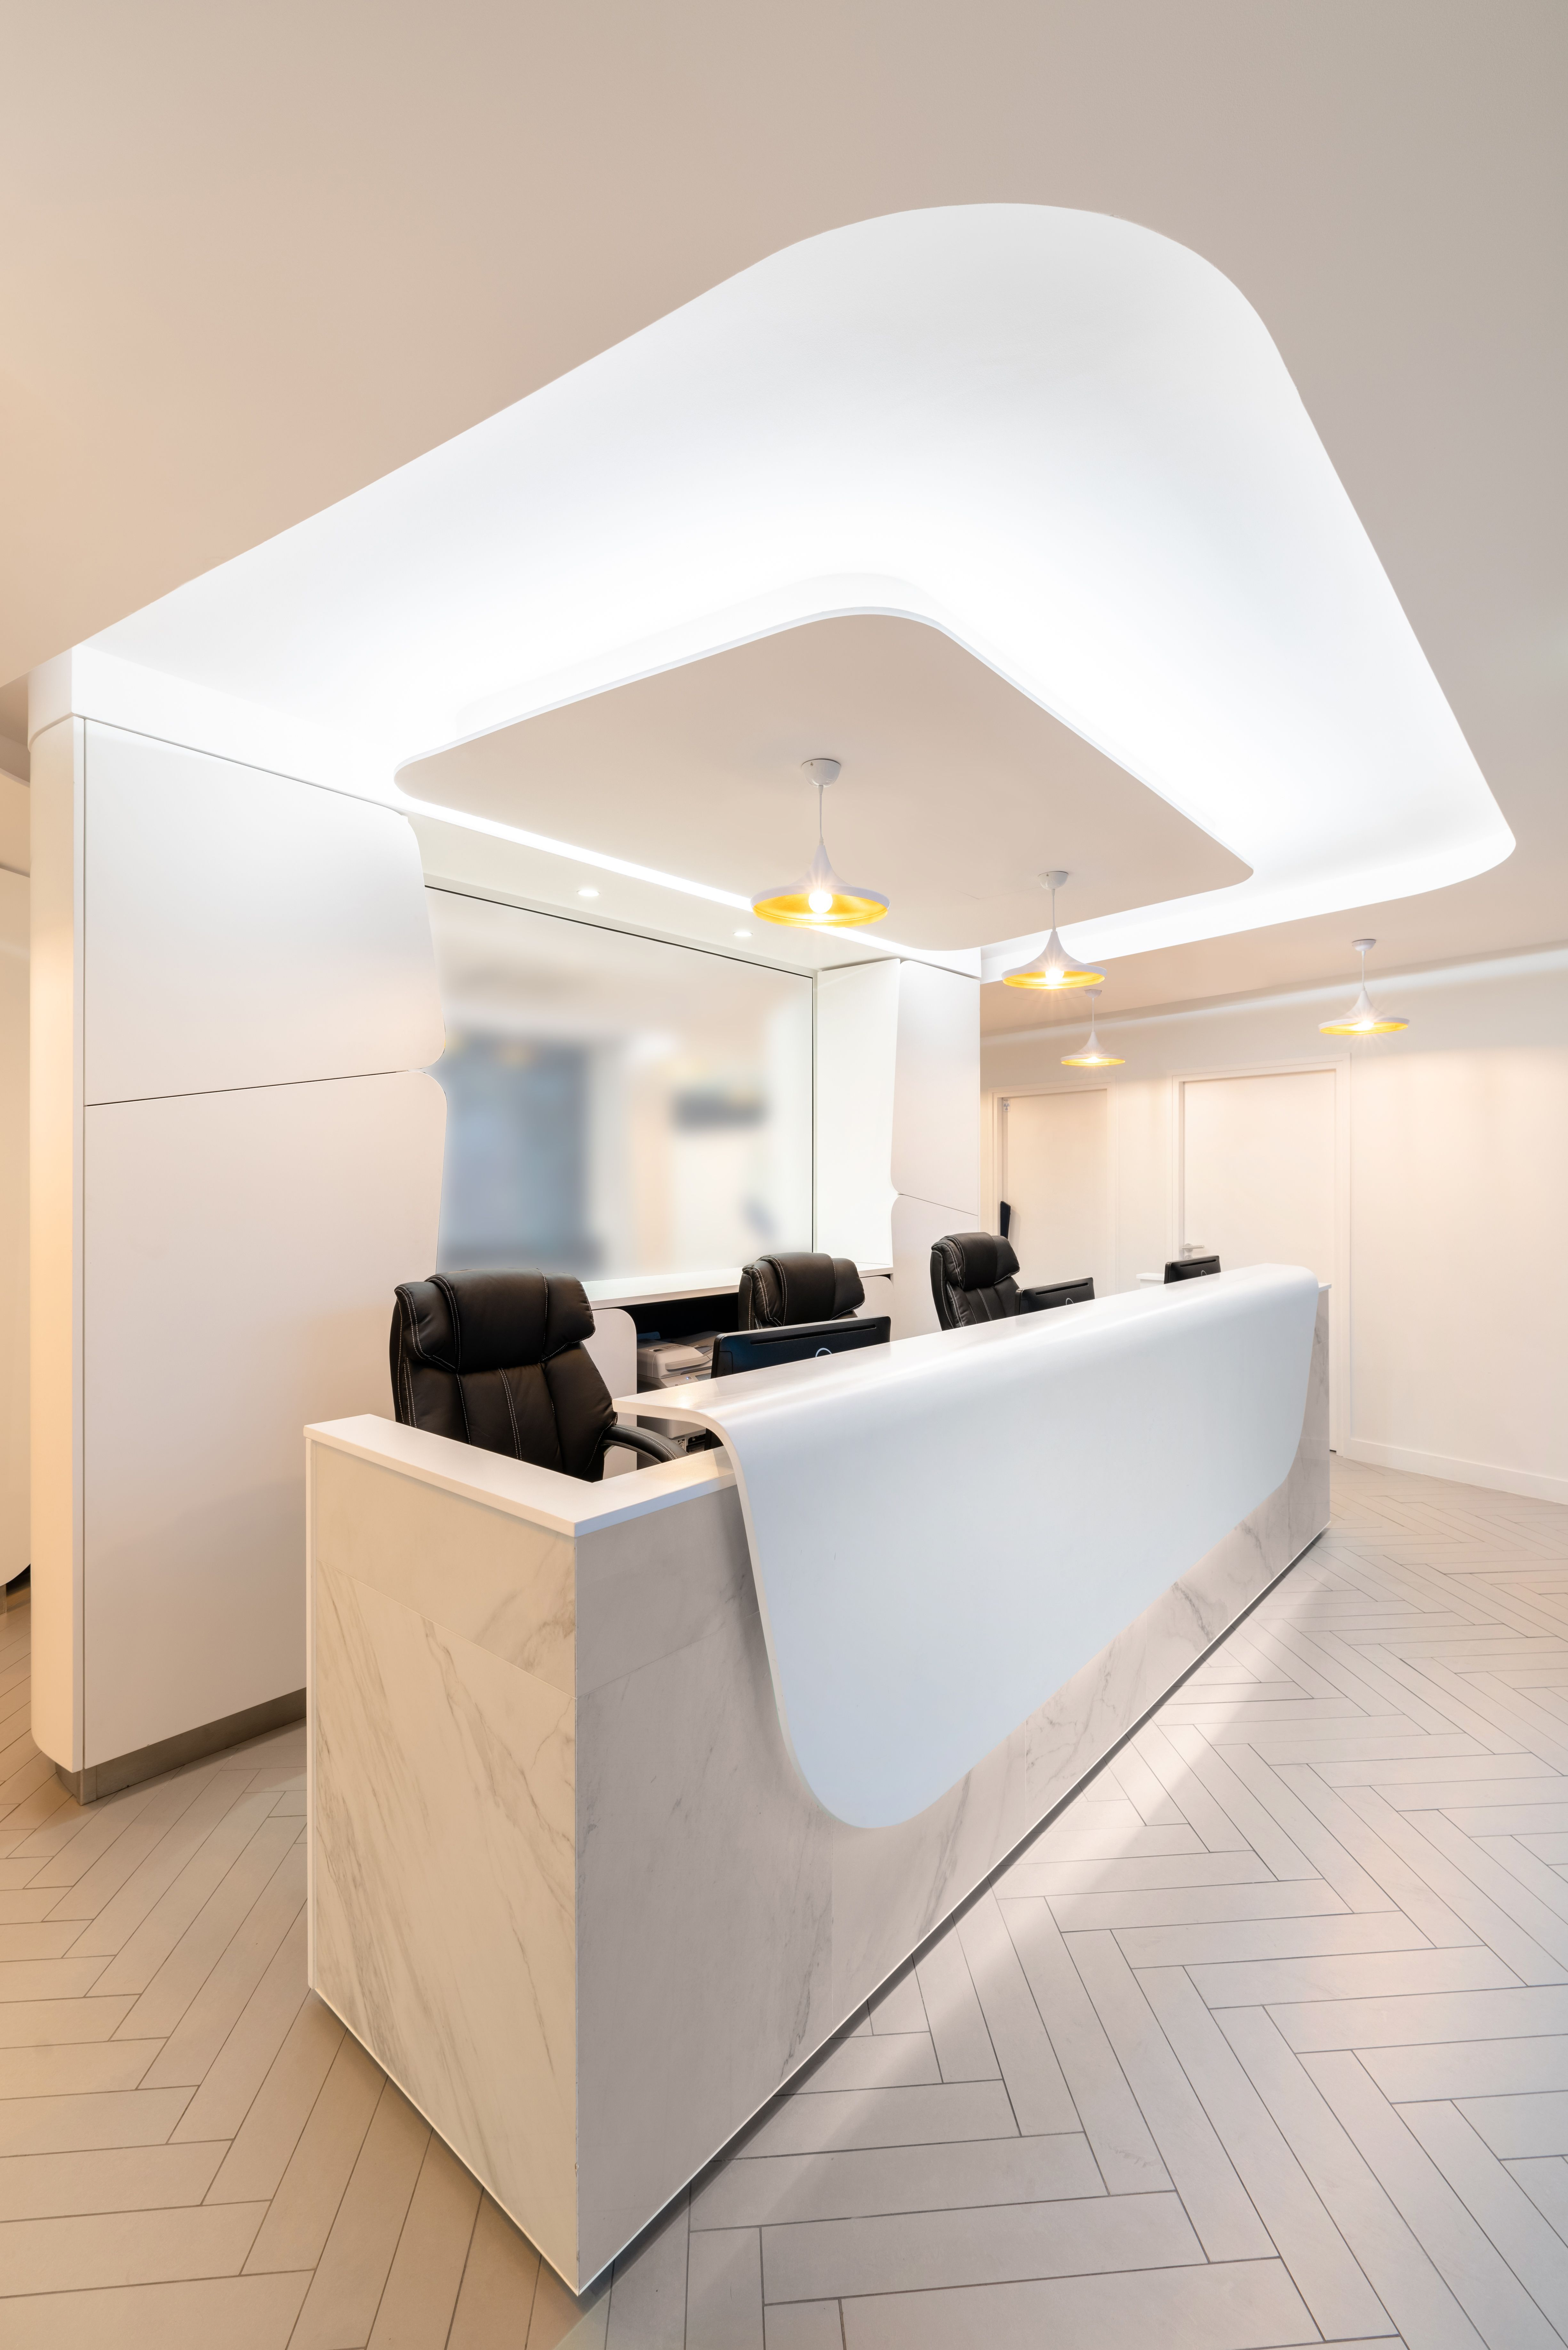 Accueil Cabinet Dentaire Design Sol Motif Chevron Borne Accueil